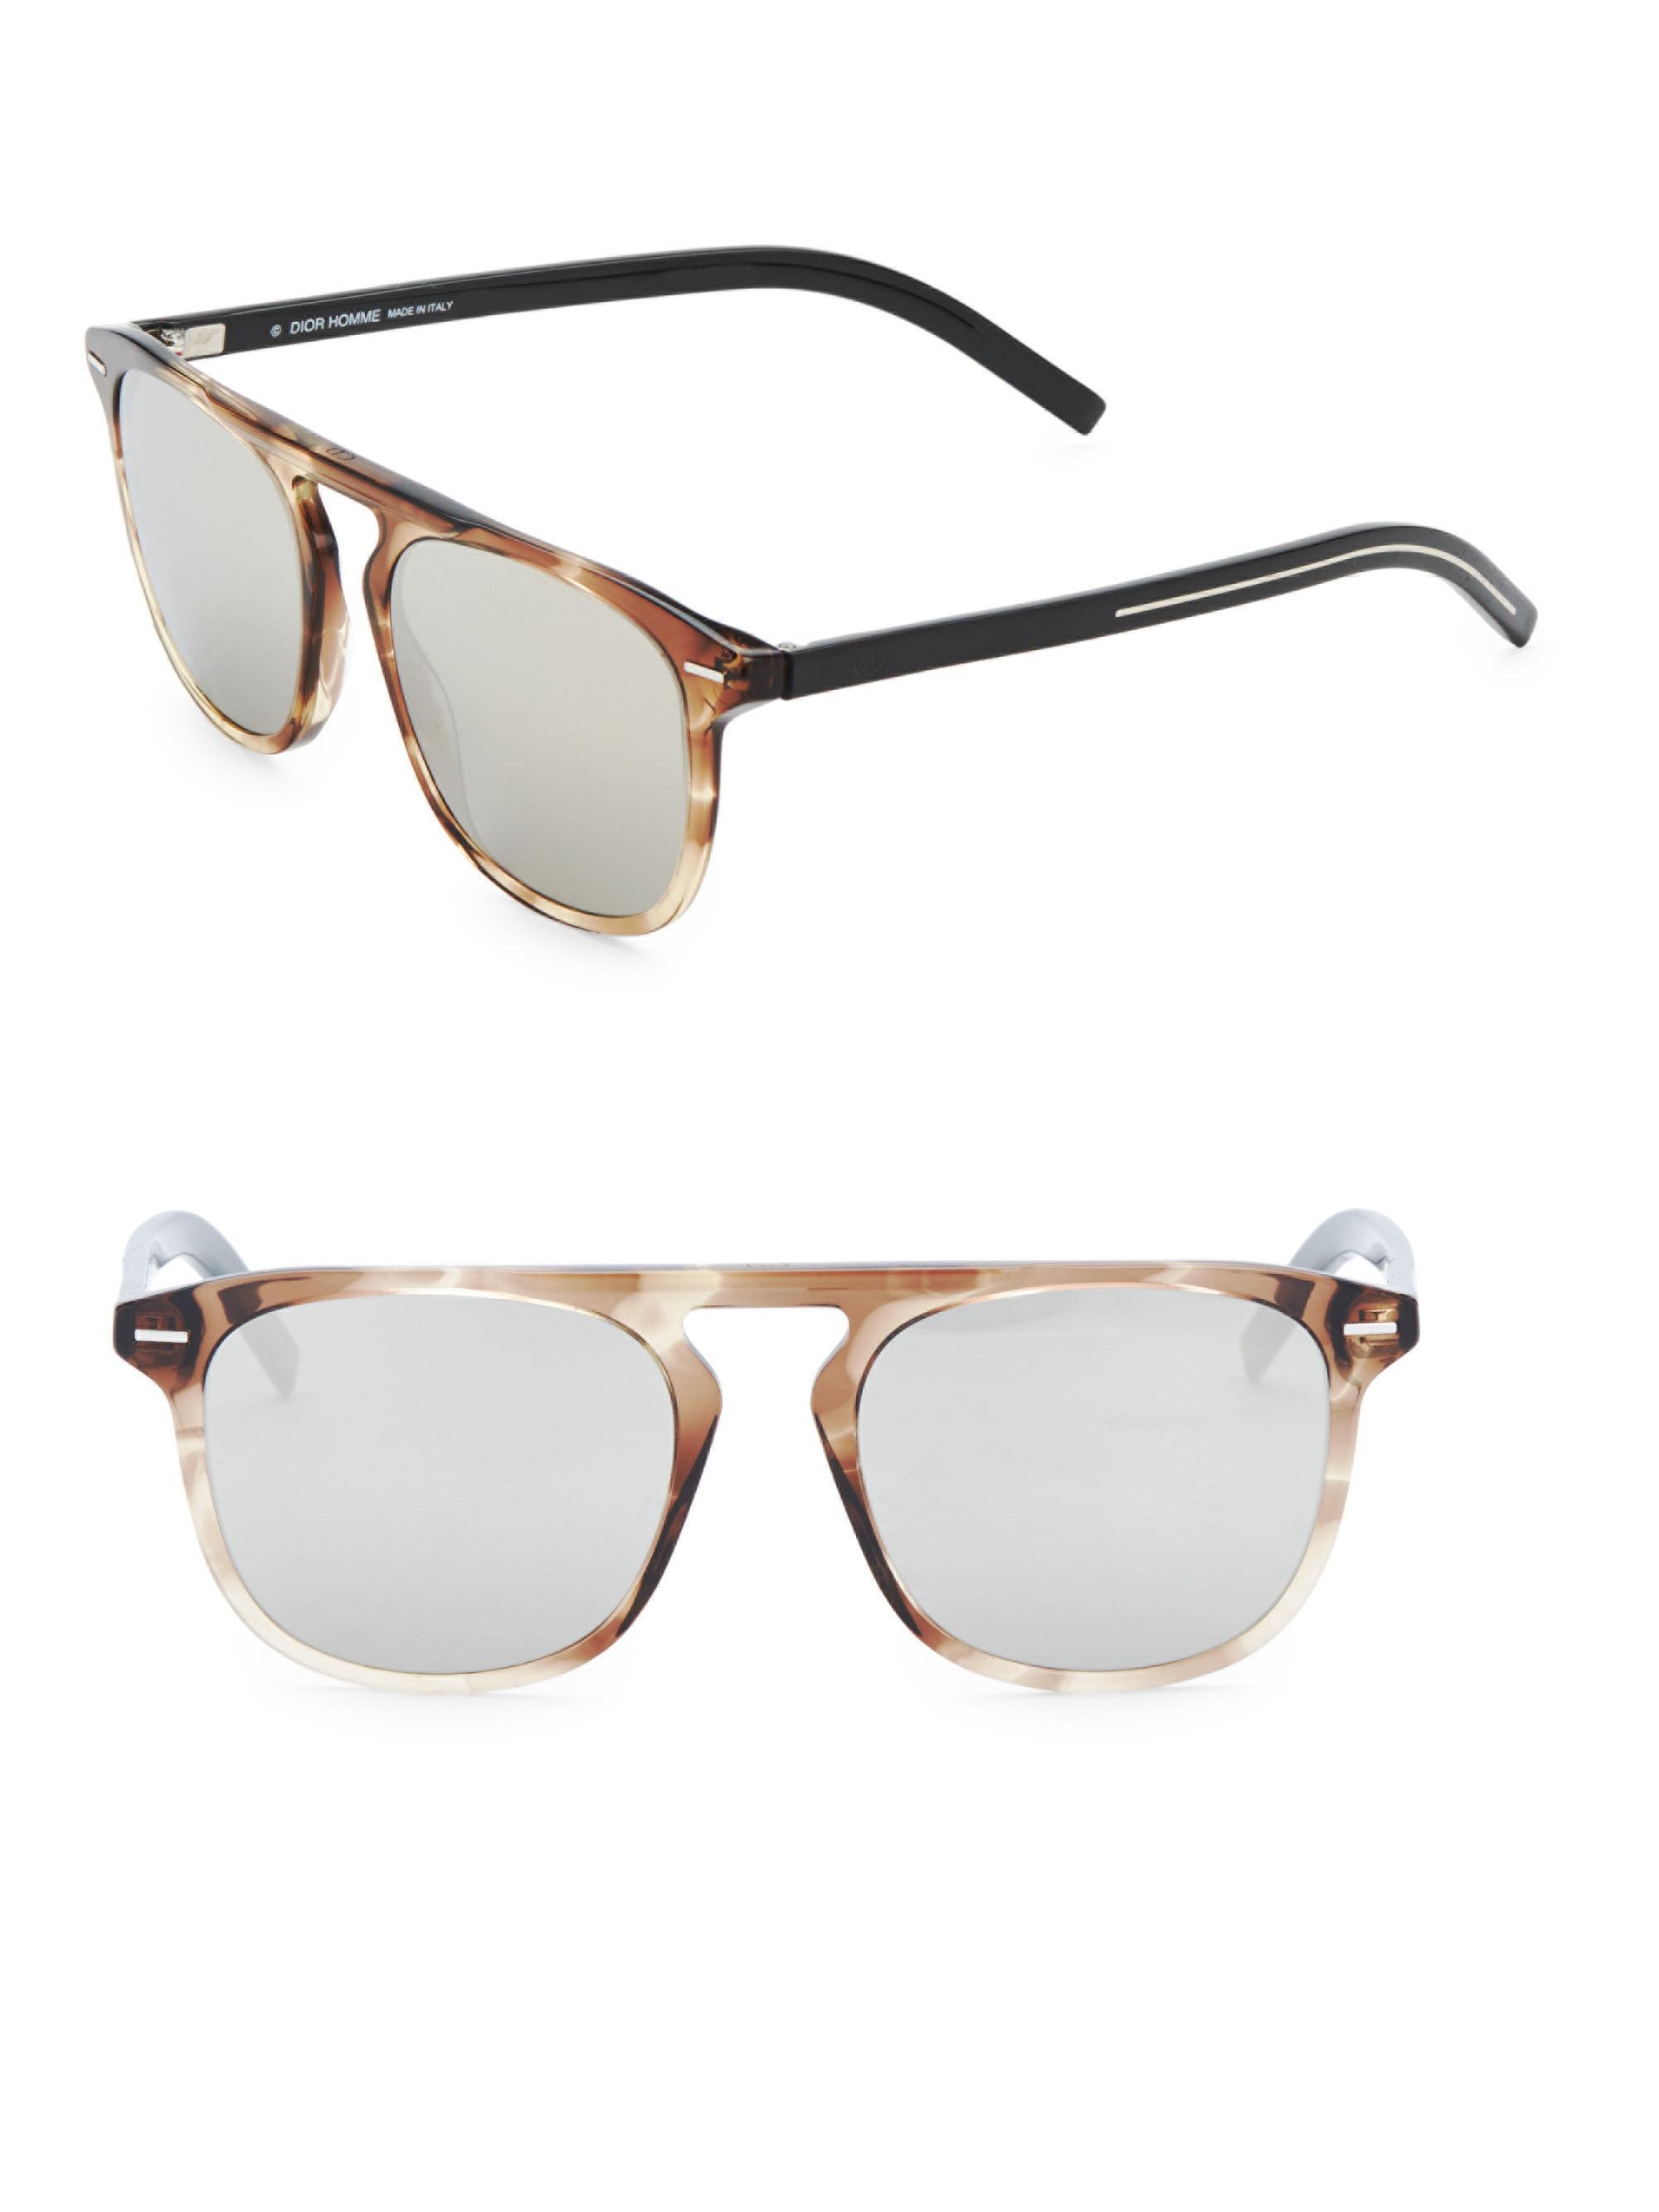 daa4e48719968 Dior Homme Black Tie 24 52mm Square Sunglasses in Gray for Men - Lyst